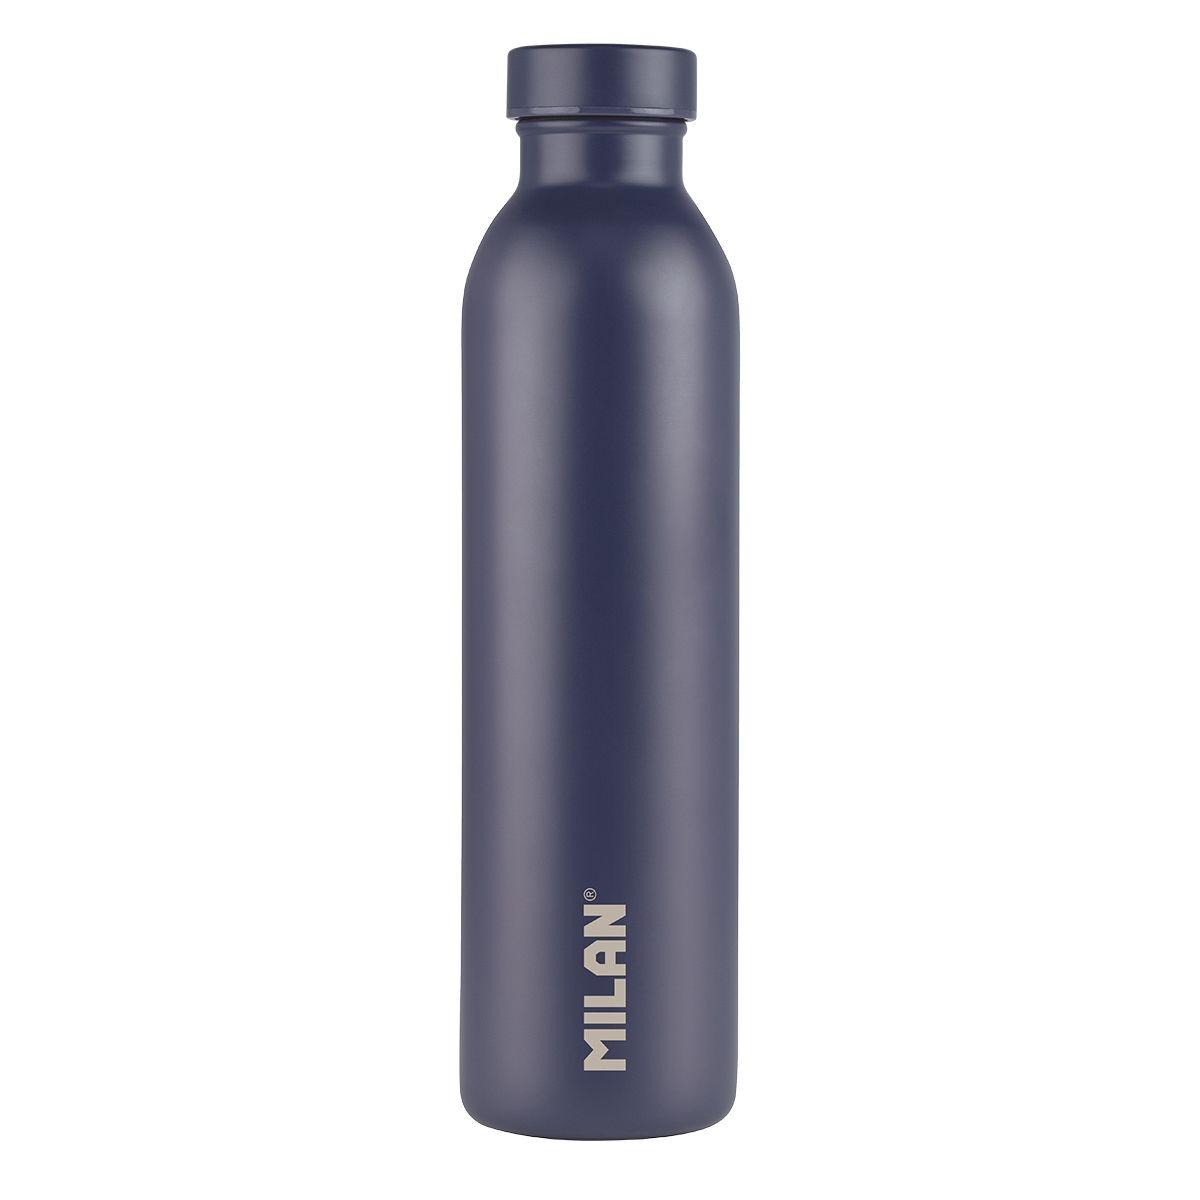 Butelka termiczna 591 ml Milan 1918 (643020B)